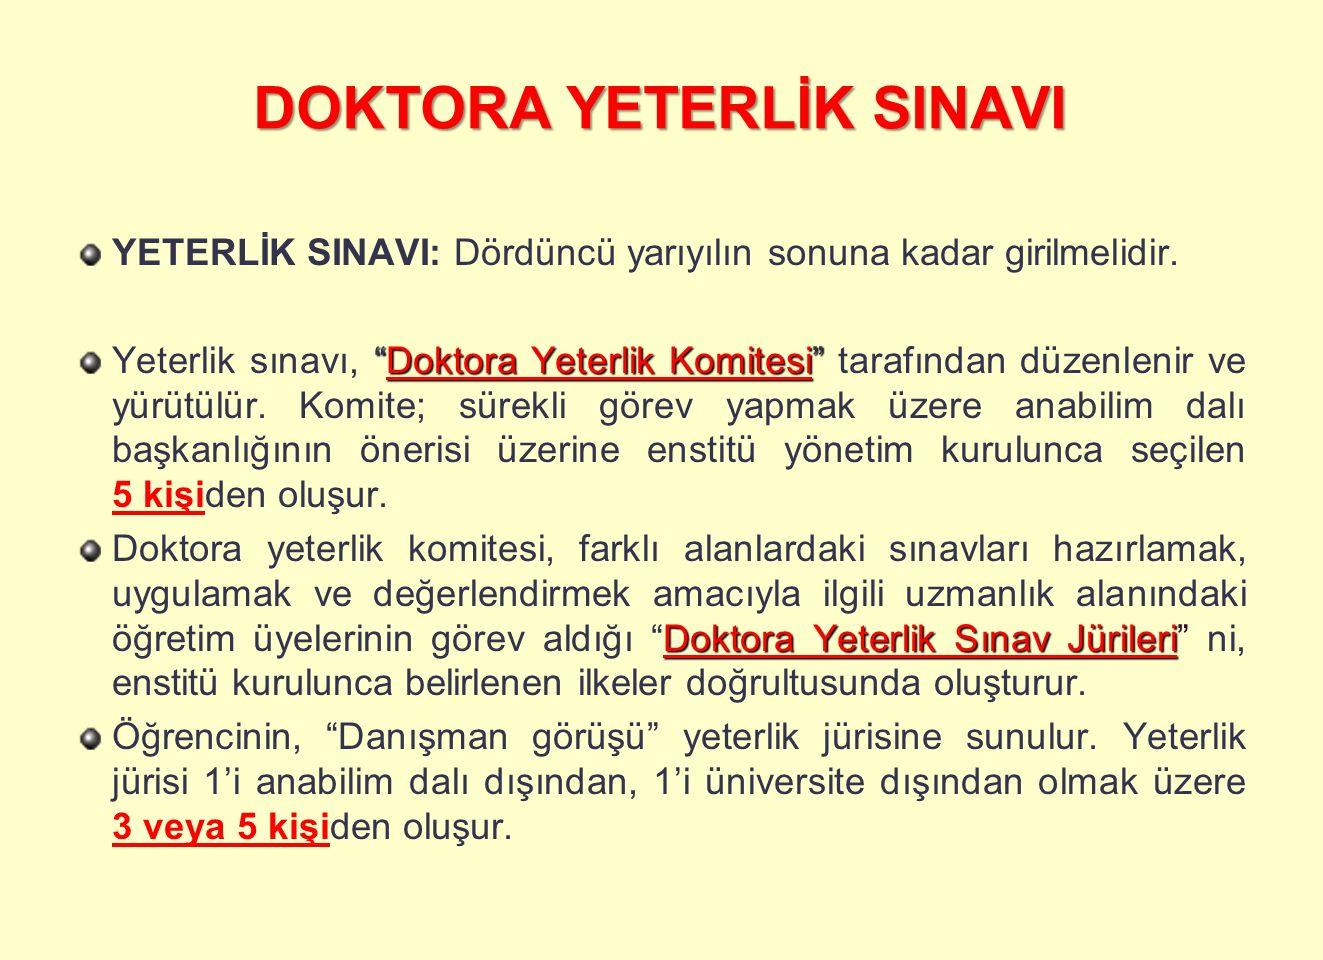 DOKTORA YETERLİK SINAVI